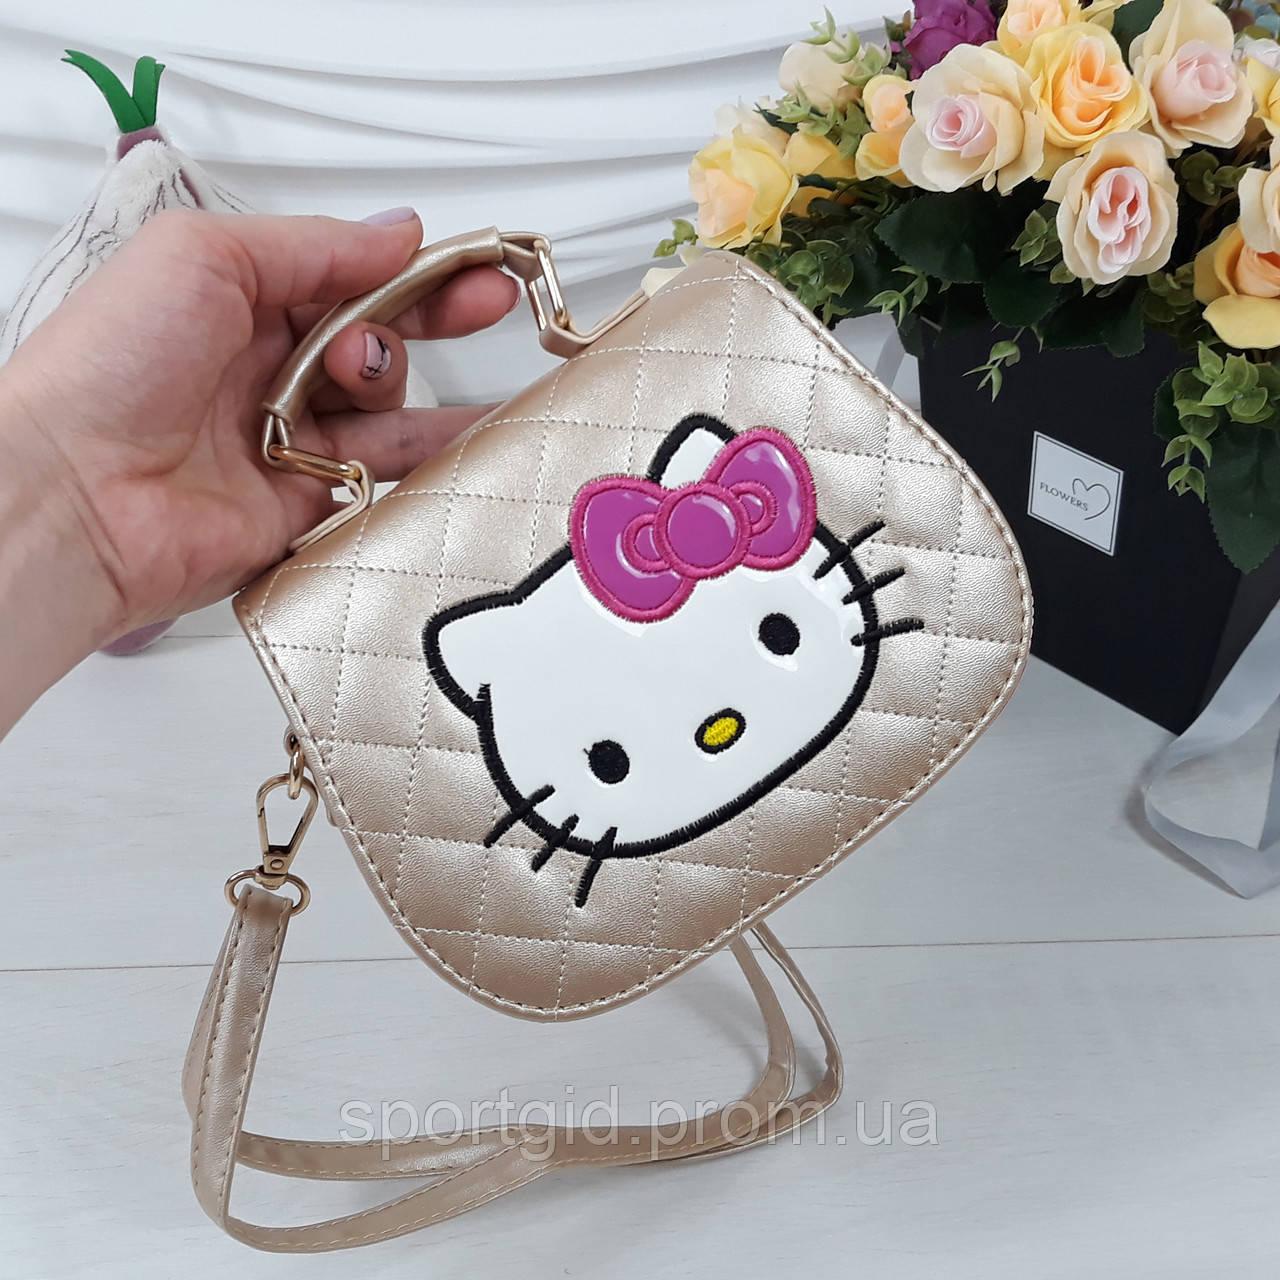 9164634a8a2e Лаковая детская сумочка для девочки Hello Kitty, цена 360 грн., купить в  Запорожье — Prom.ua (ID#431758125)